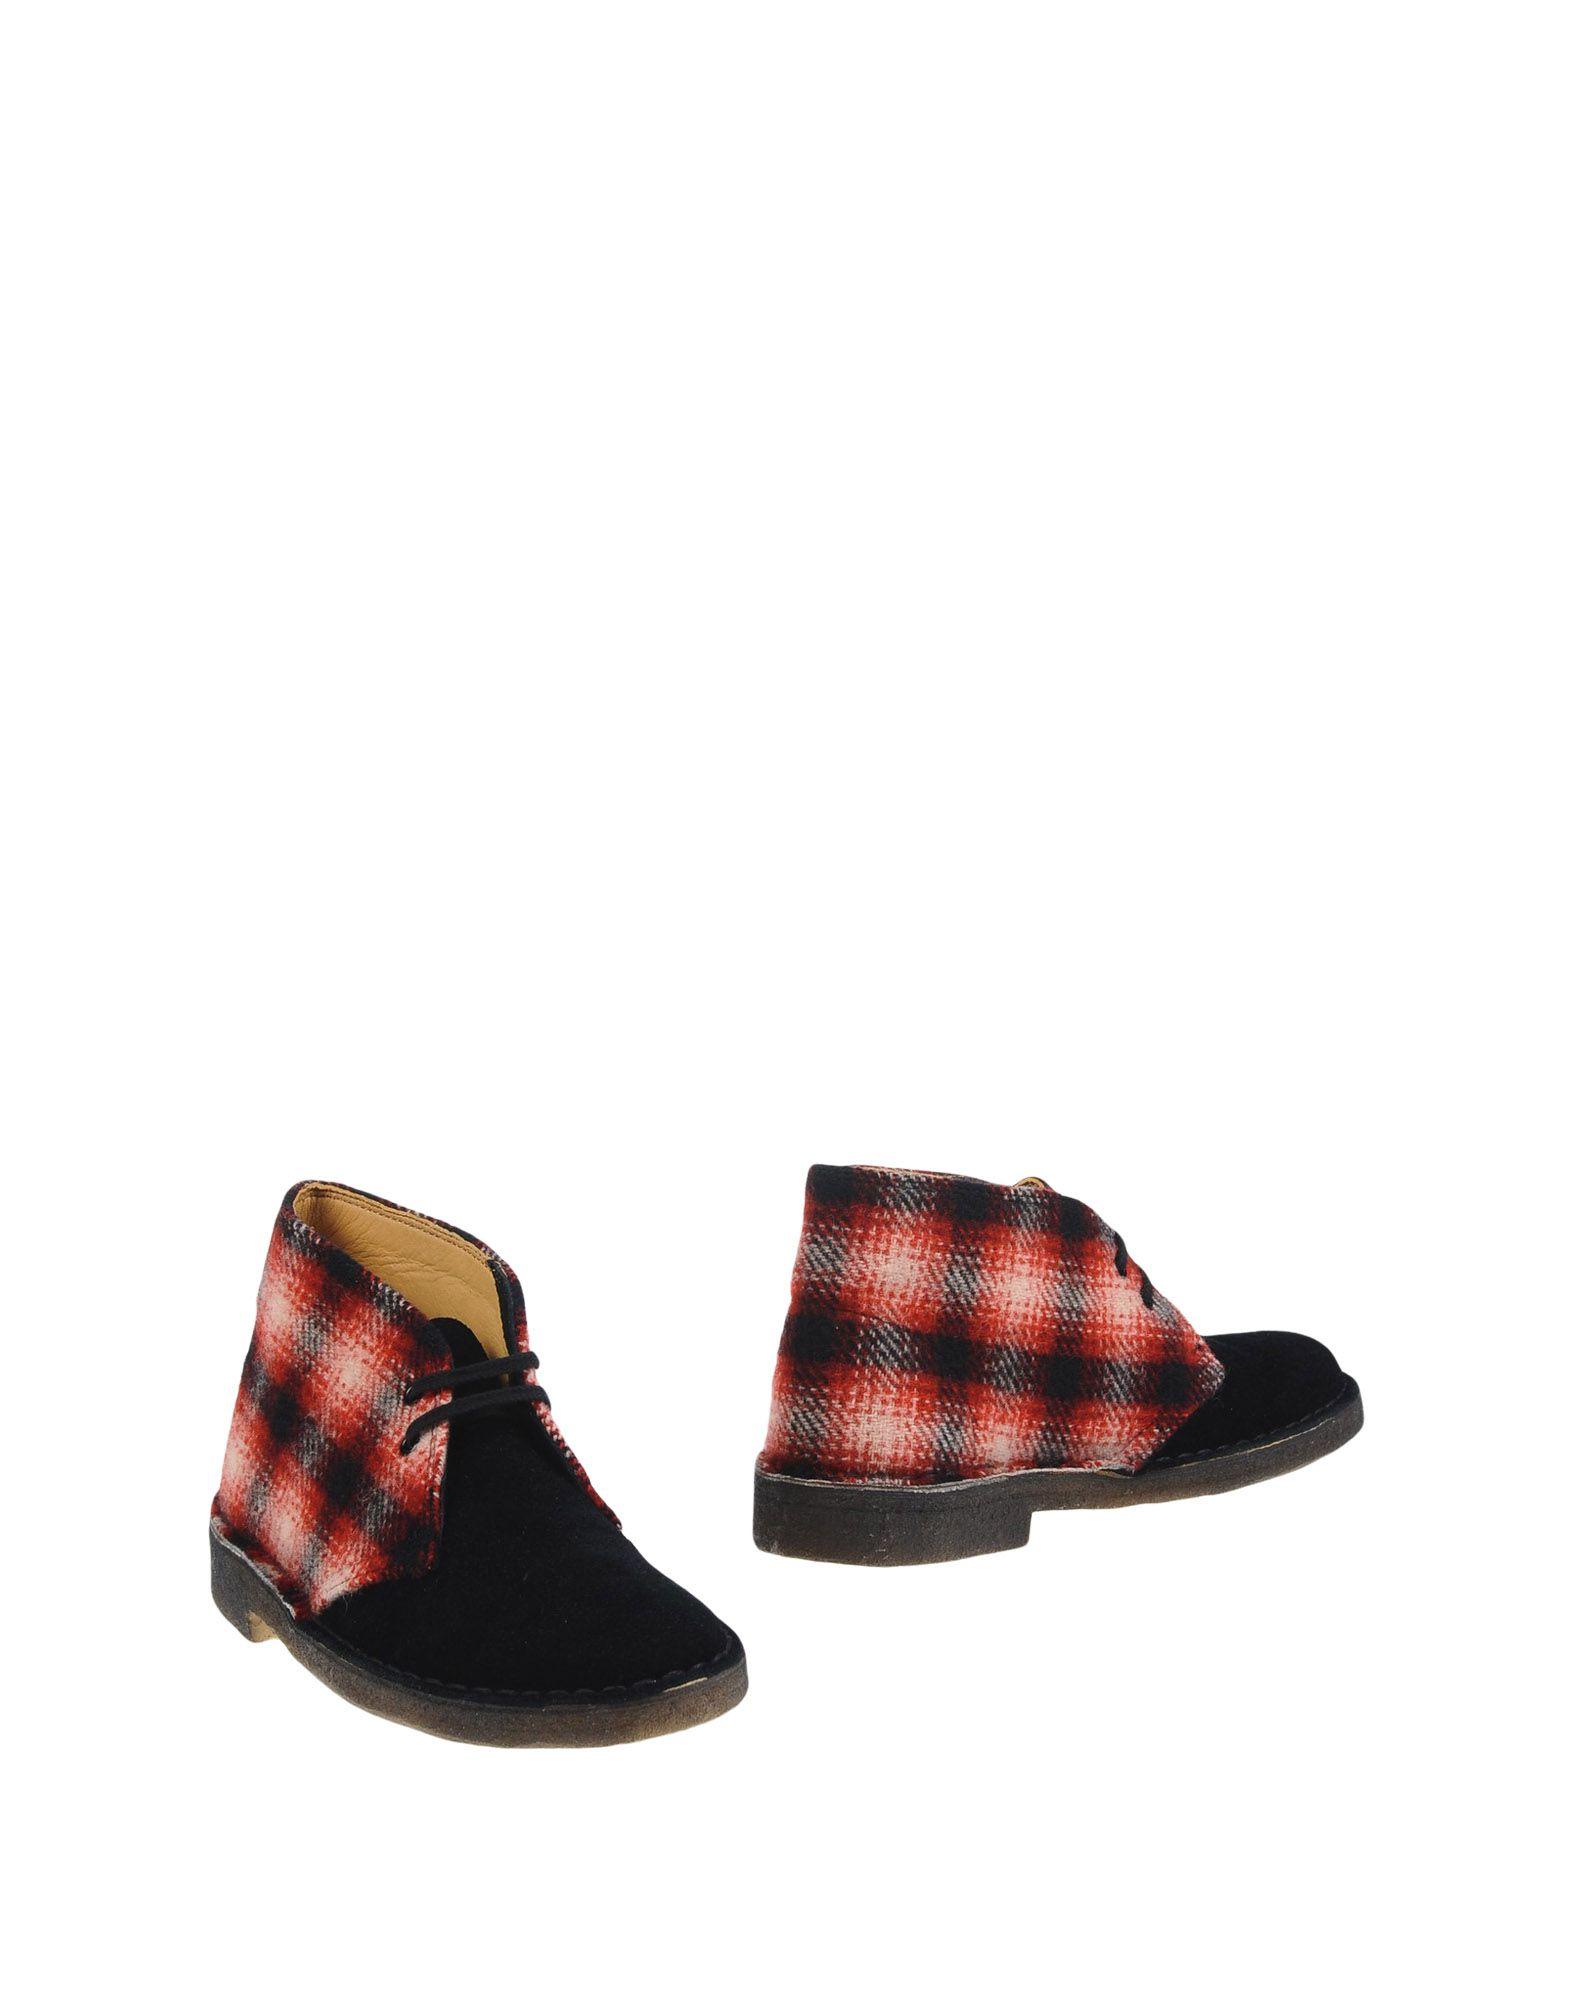 CLARKS ORIGINALS Полусапоги и высокие ботинки ботинки дерби clarks stafford park5